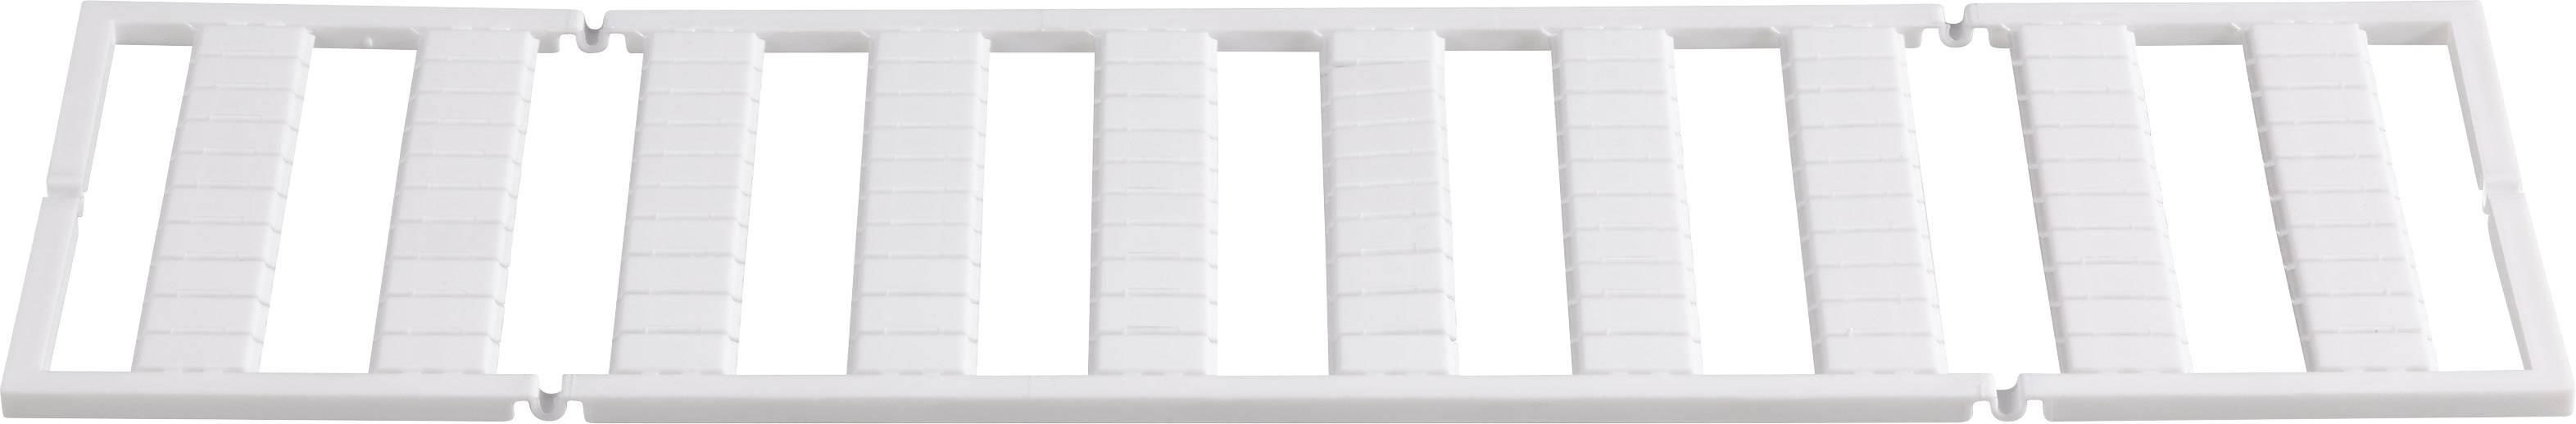 Mostík pre svorkovnice WAGO, WAGO 793-5501, 1 ks